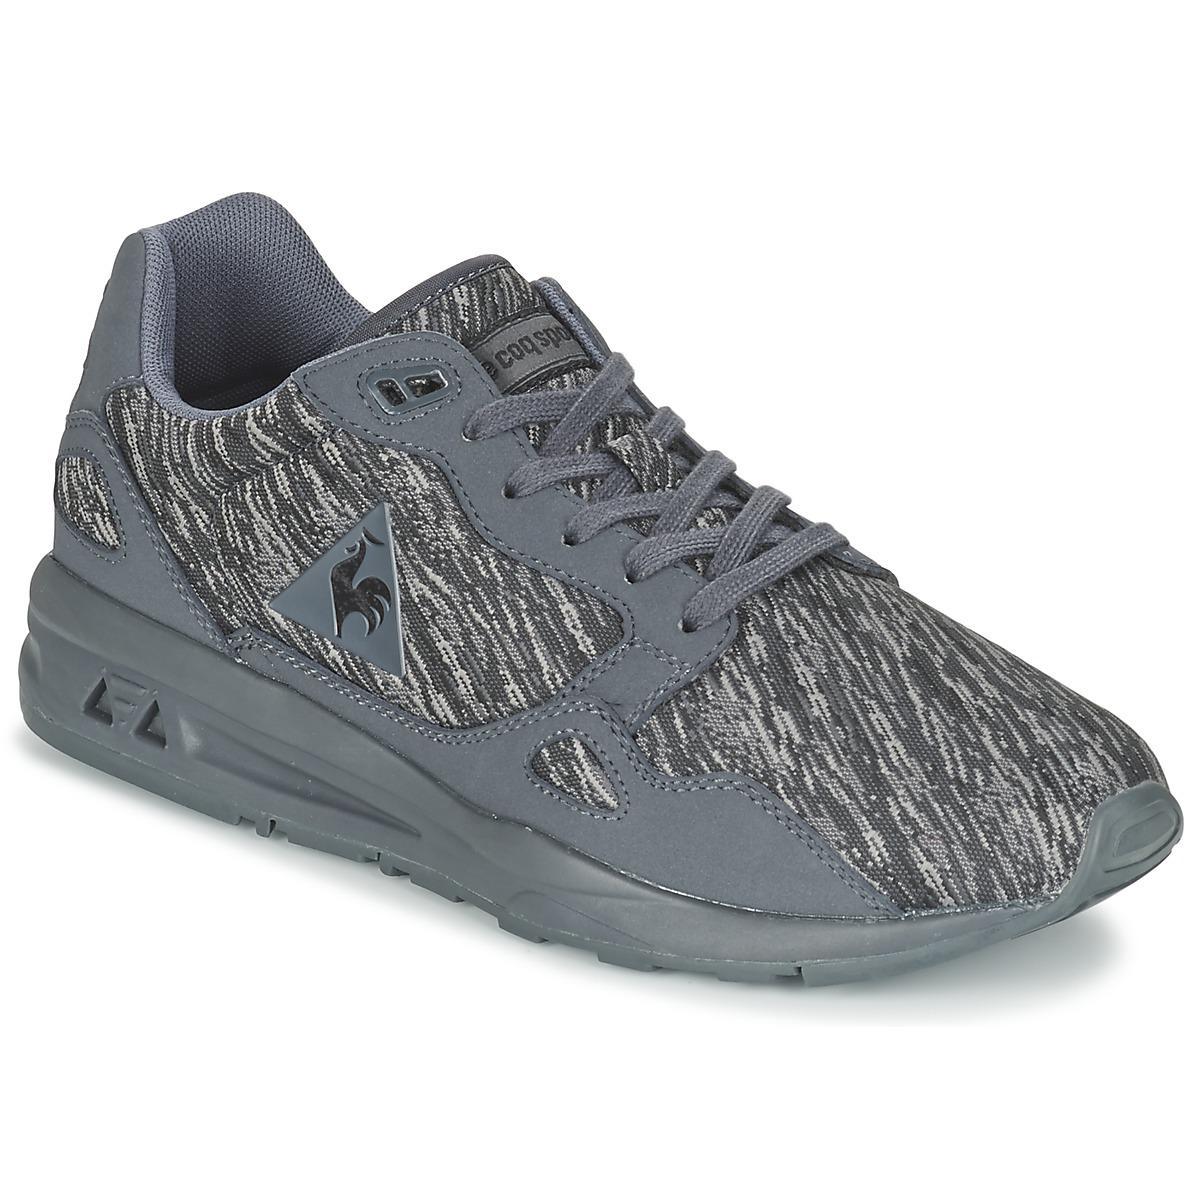 Le Coq Sportif Lcs R900 Interstellar Jacquard Men's Shoes ...